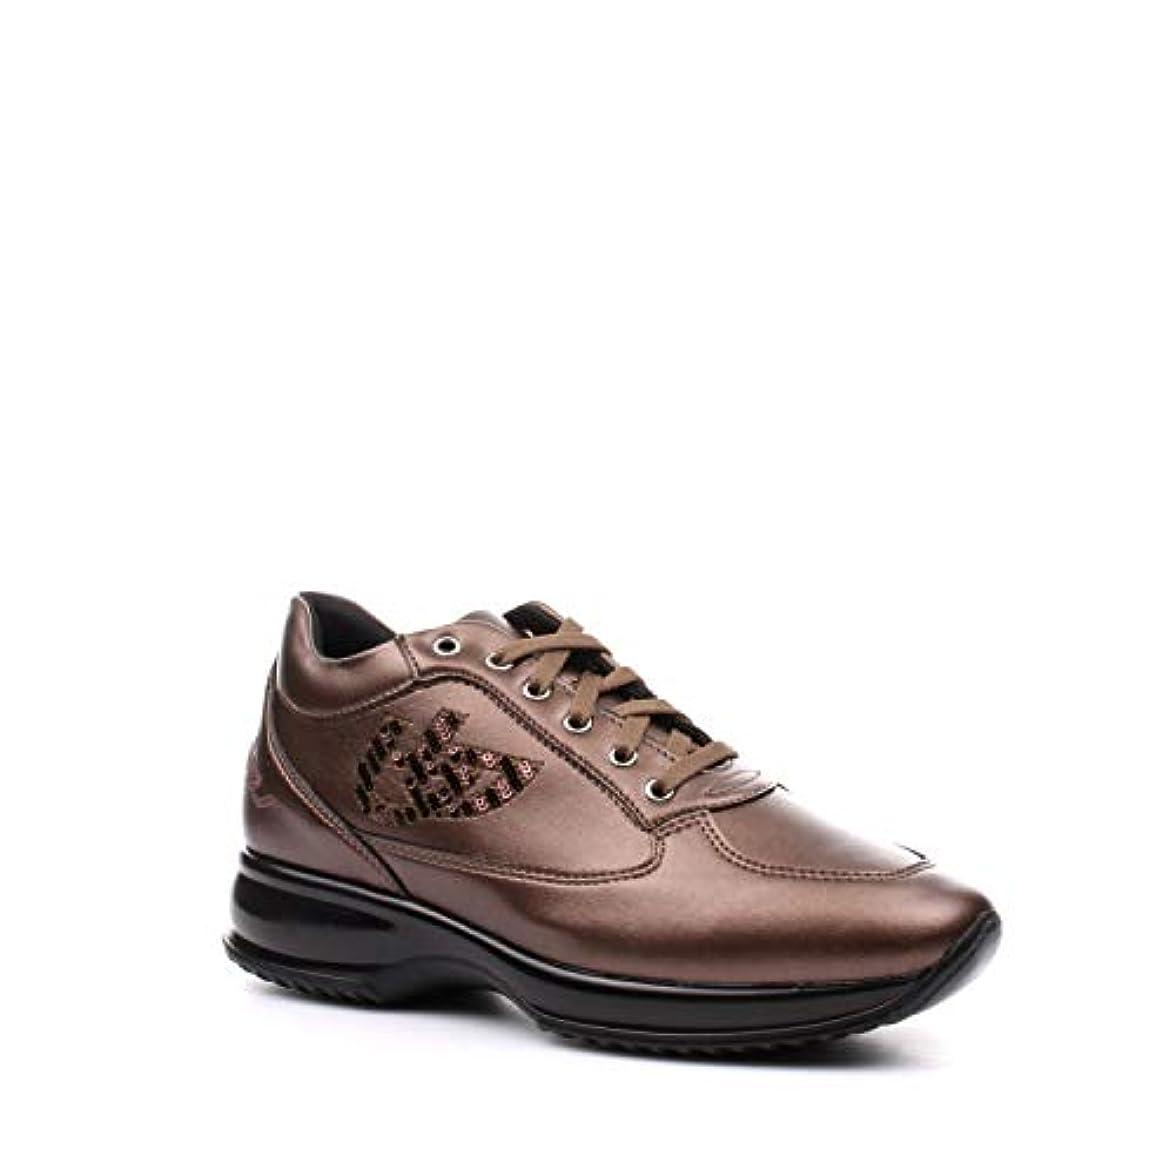 Byblos Blu Sneaker Pelle - Autunno Inverno